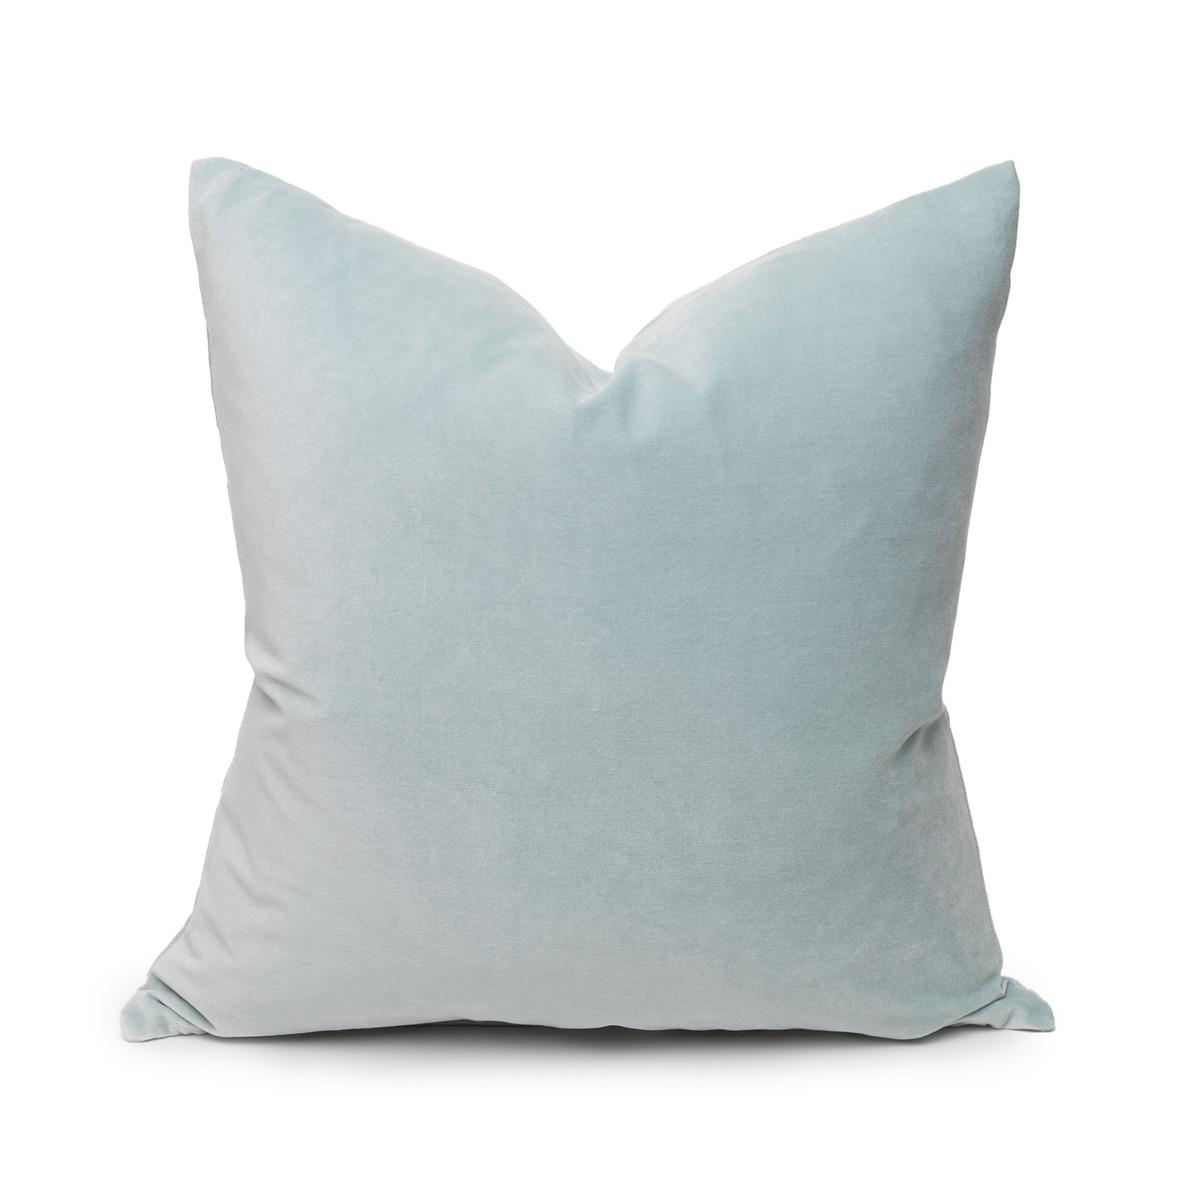 Sophie Larimar Aqua Velvet Decorative Pillow - Front